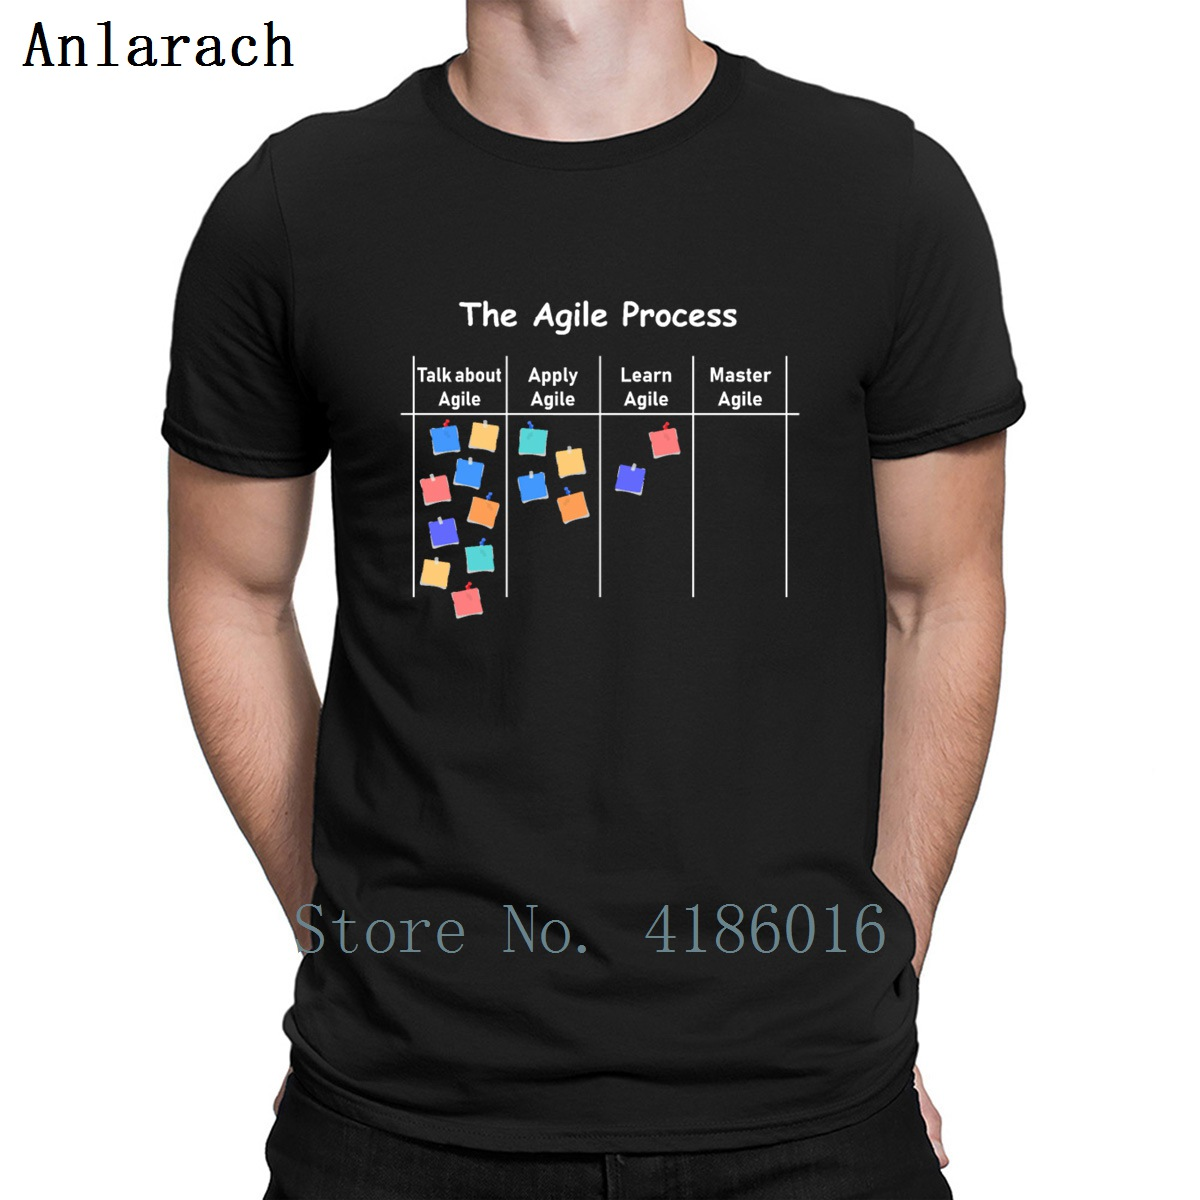 Agile Process Aoe Project Process Management T Shirt Loose Summer Create Cotton Standard S-5xl Unique Humor Shirt